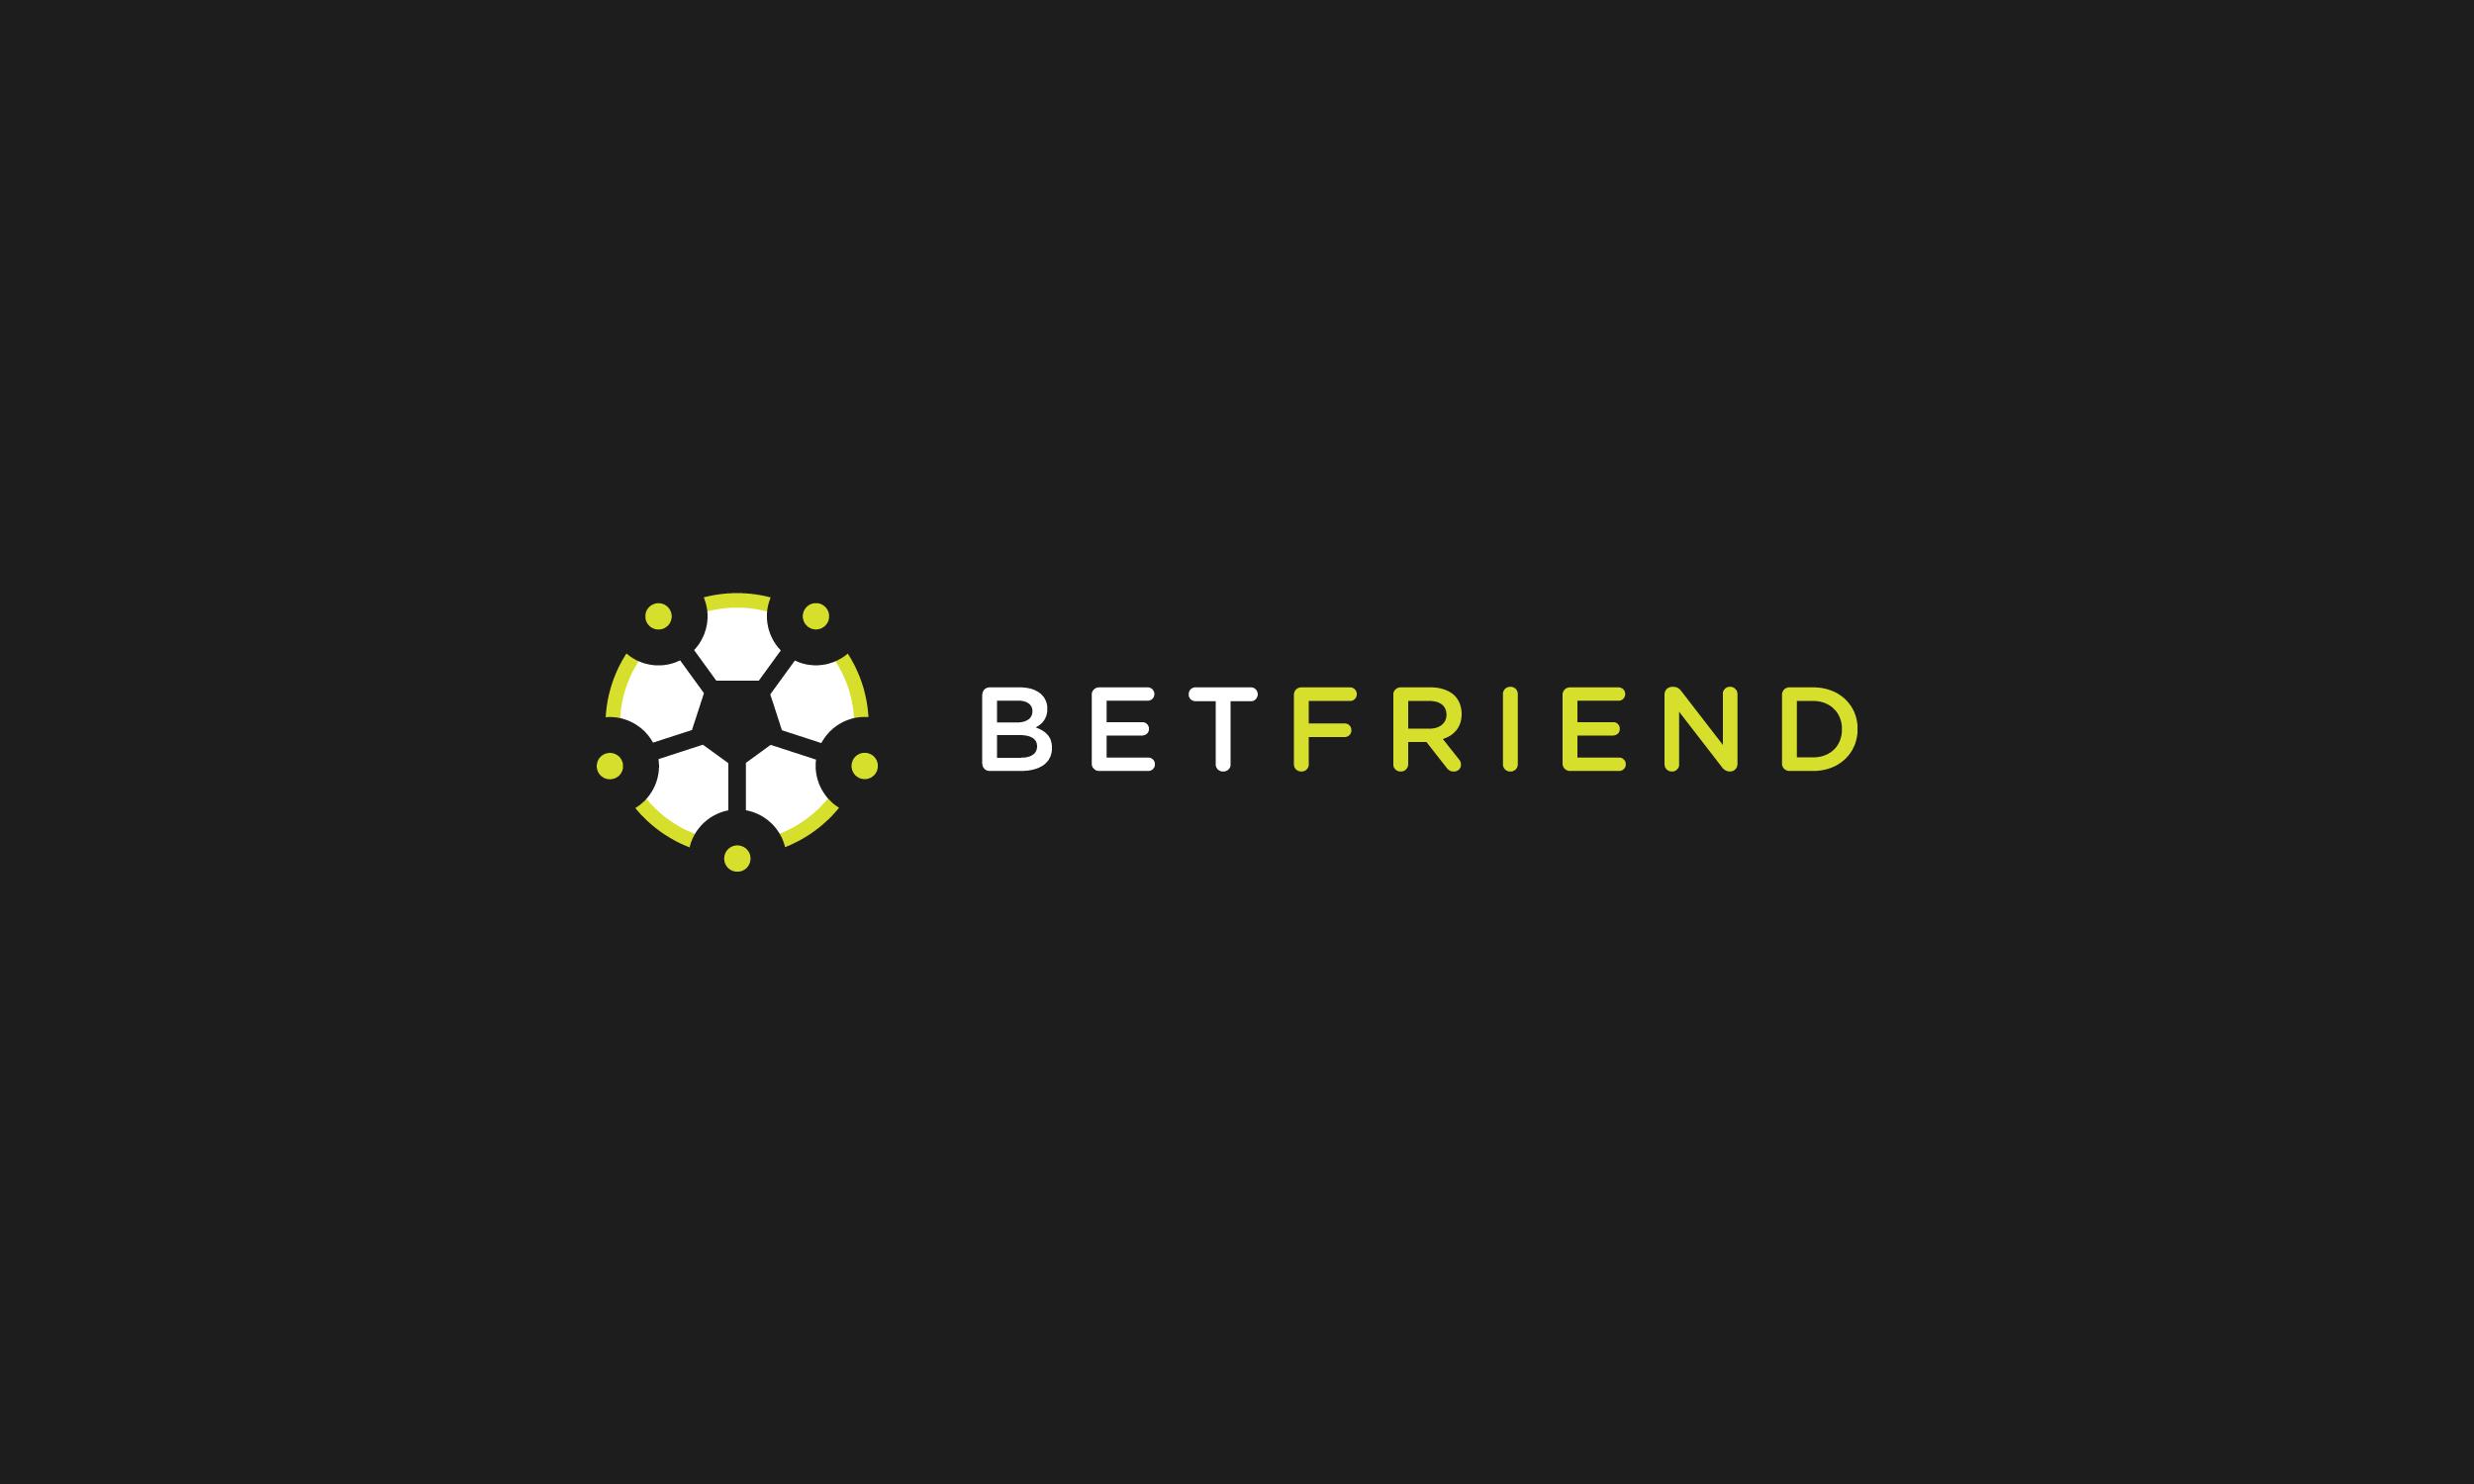 Logo Design and Brand Identity Kent - Betfriend